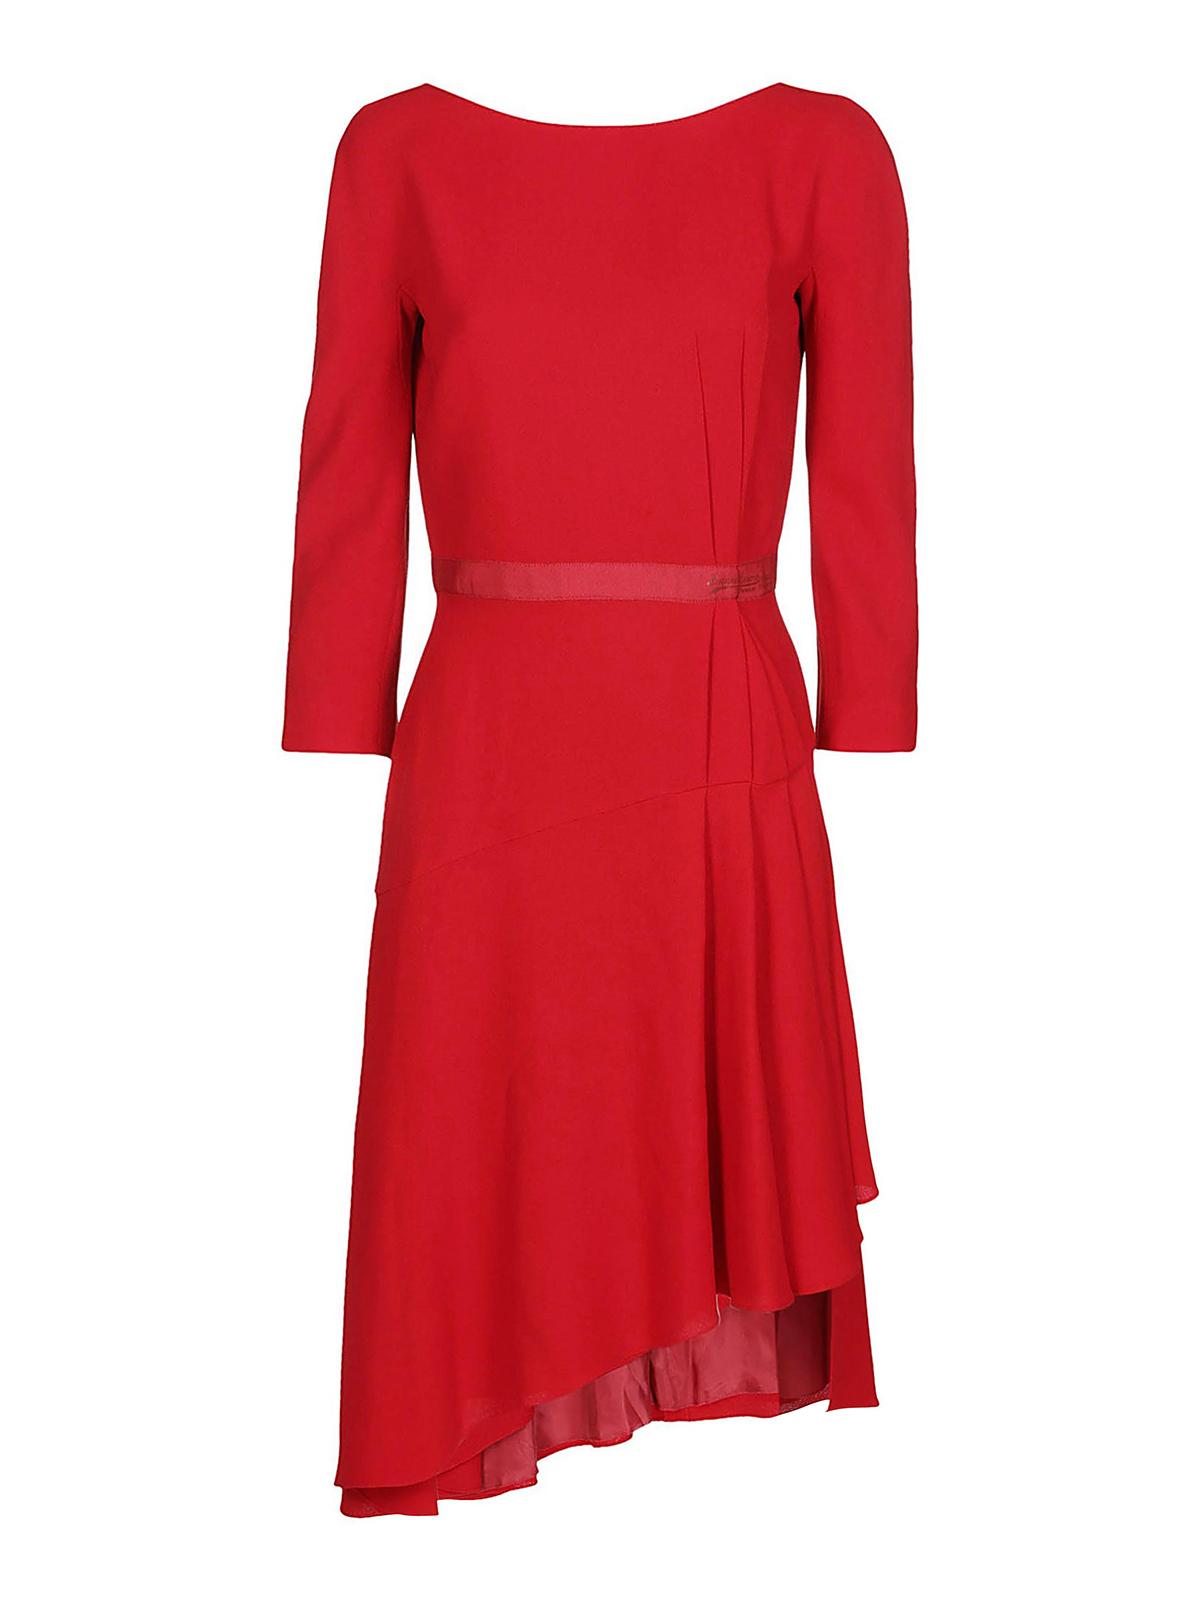 Lanvin ASYMMETRICAL PLEATED LONG SLEEVE DRESS